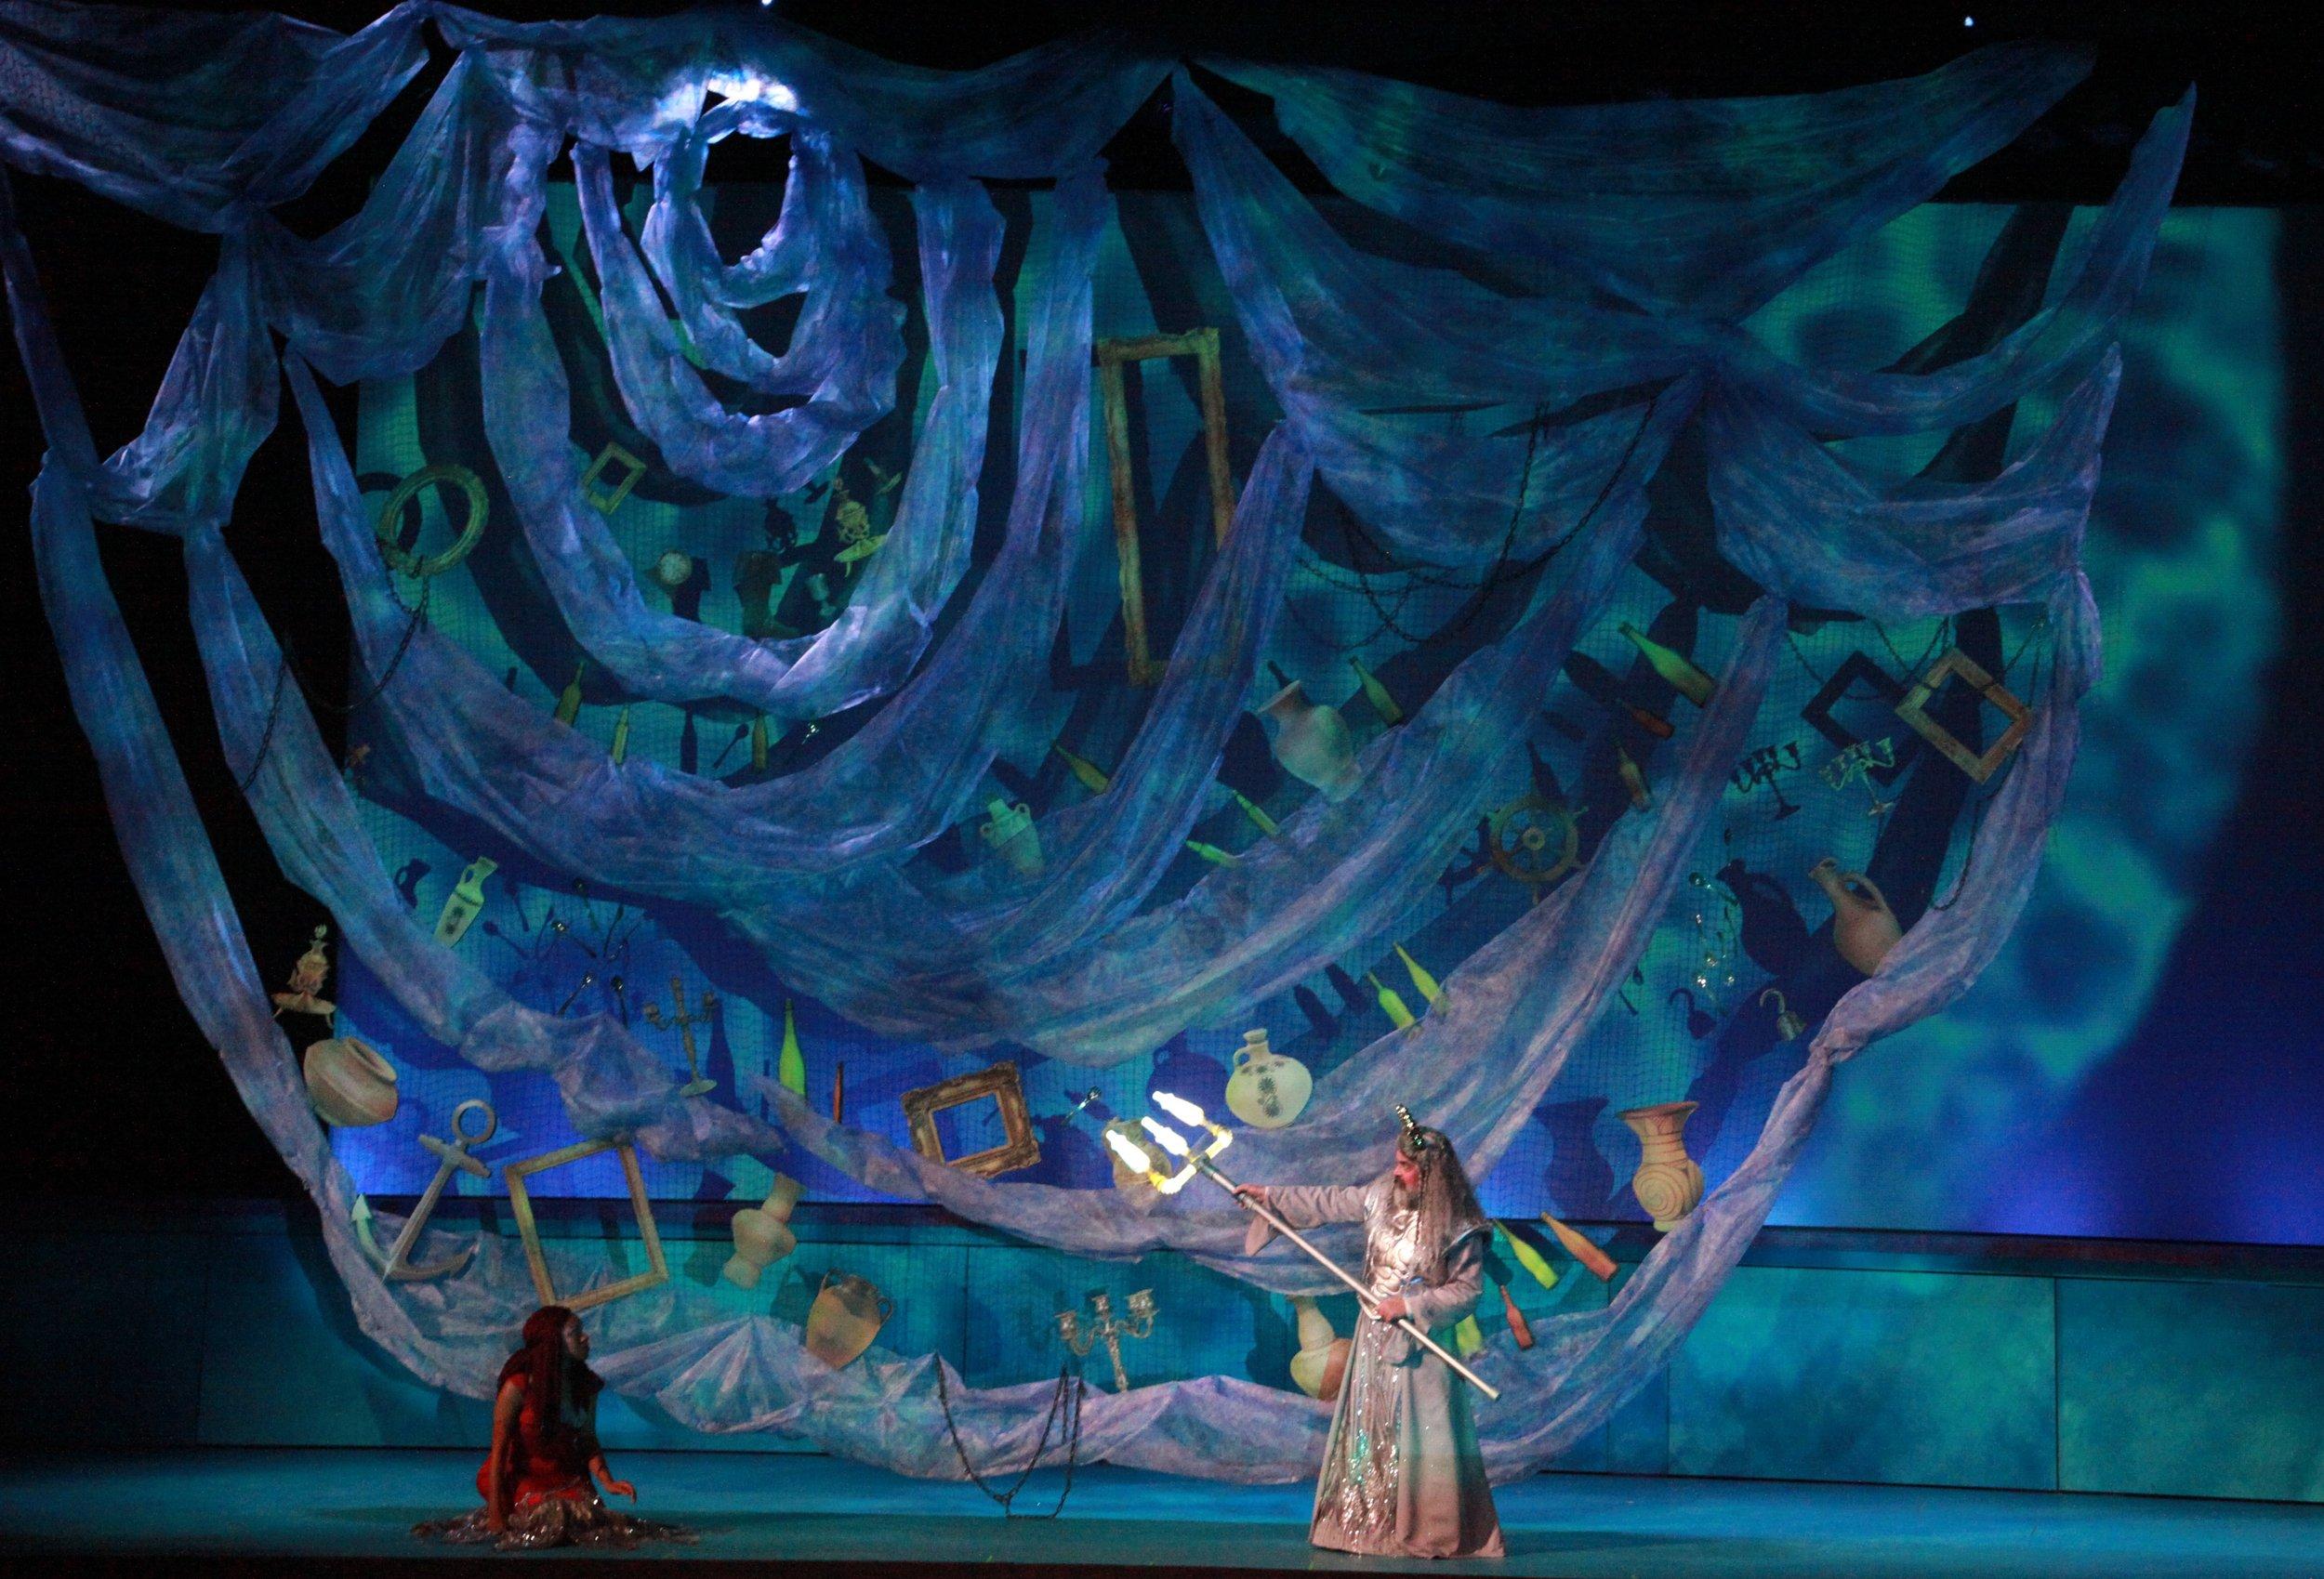 King Triton - The Little Mermaid